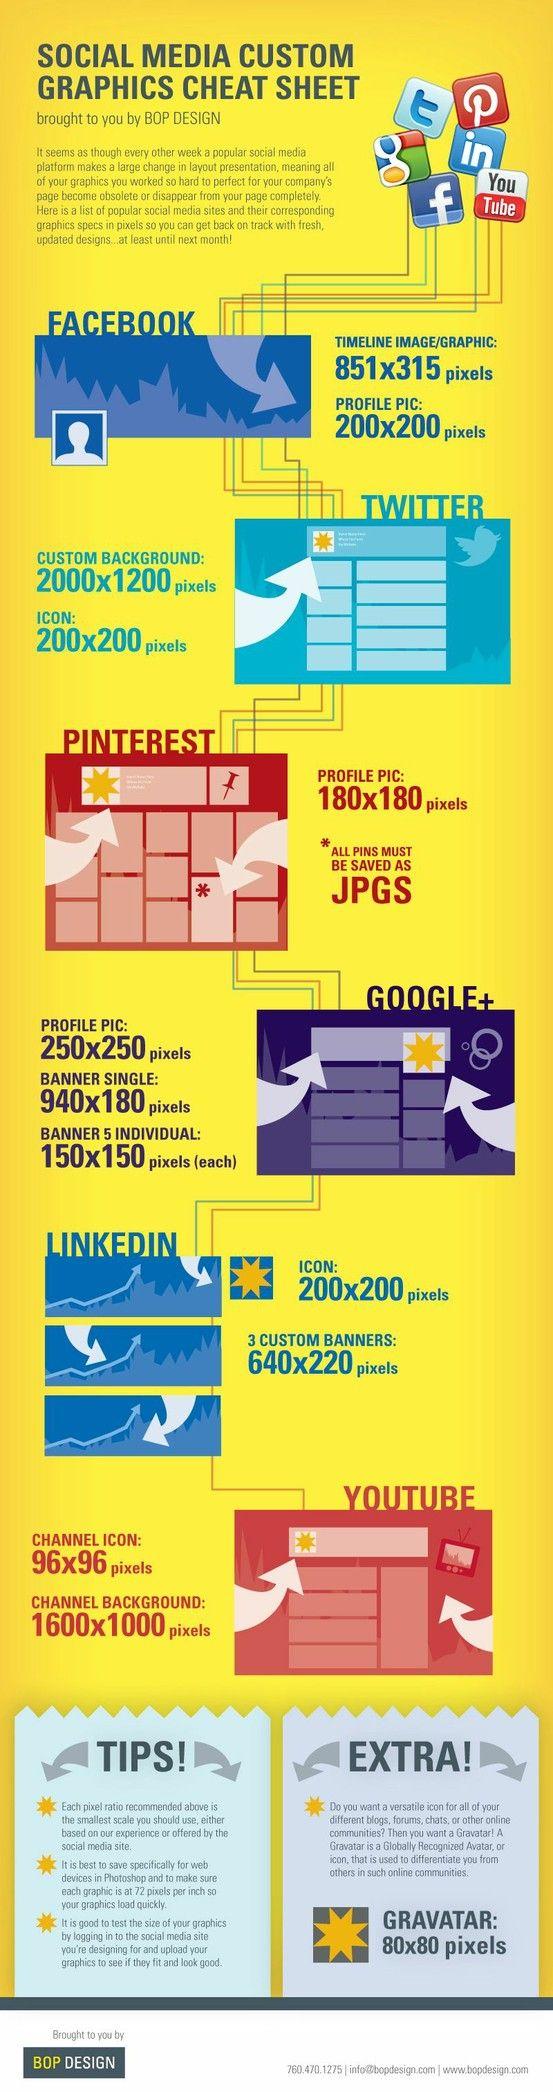 Social Media Custom Graphics Cheat Sheet #socialmedia #dimensions